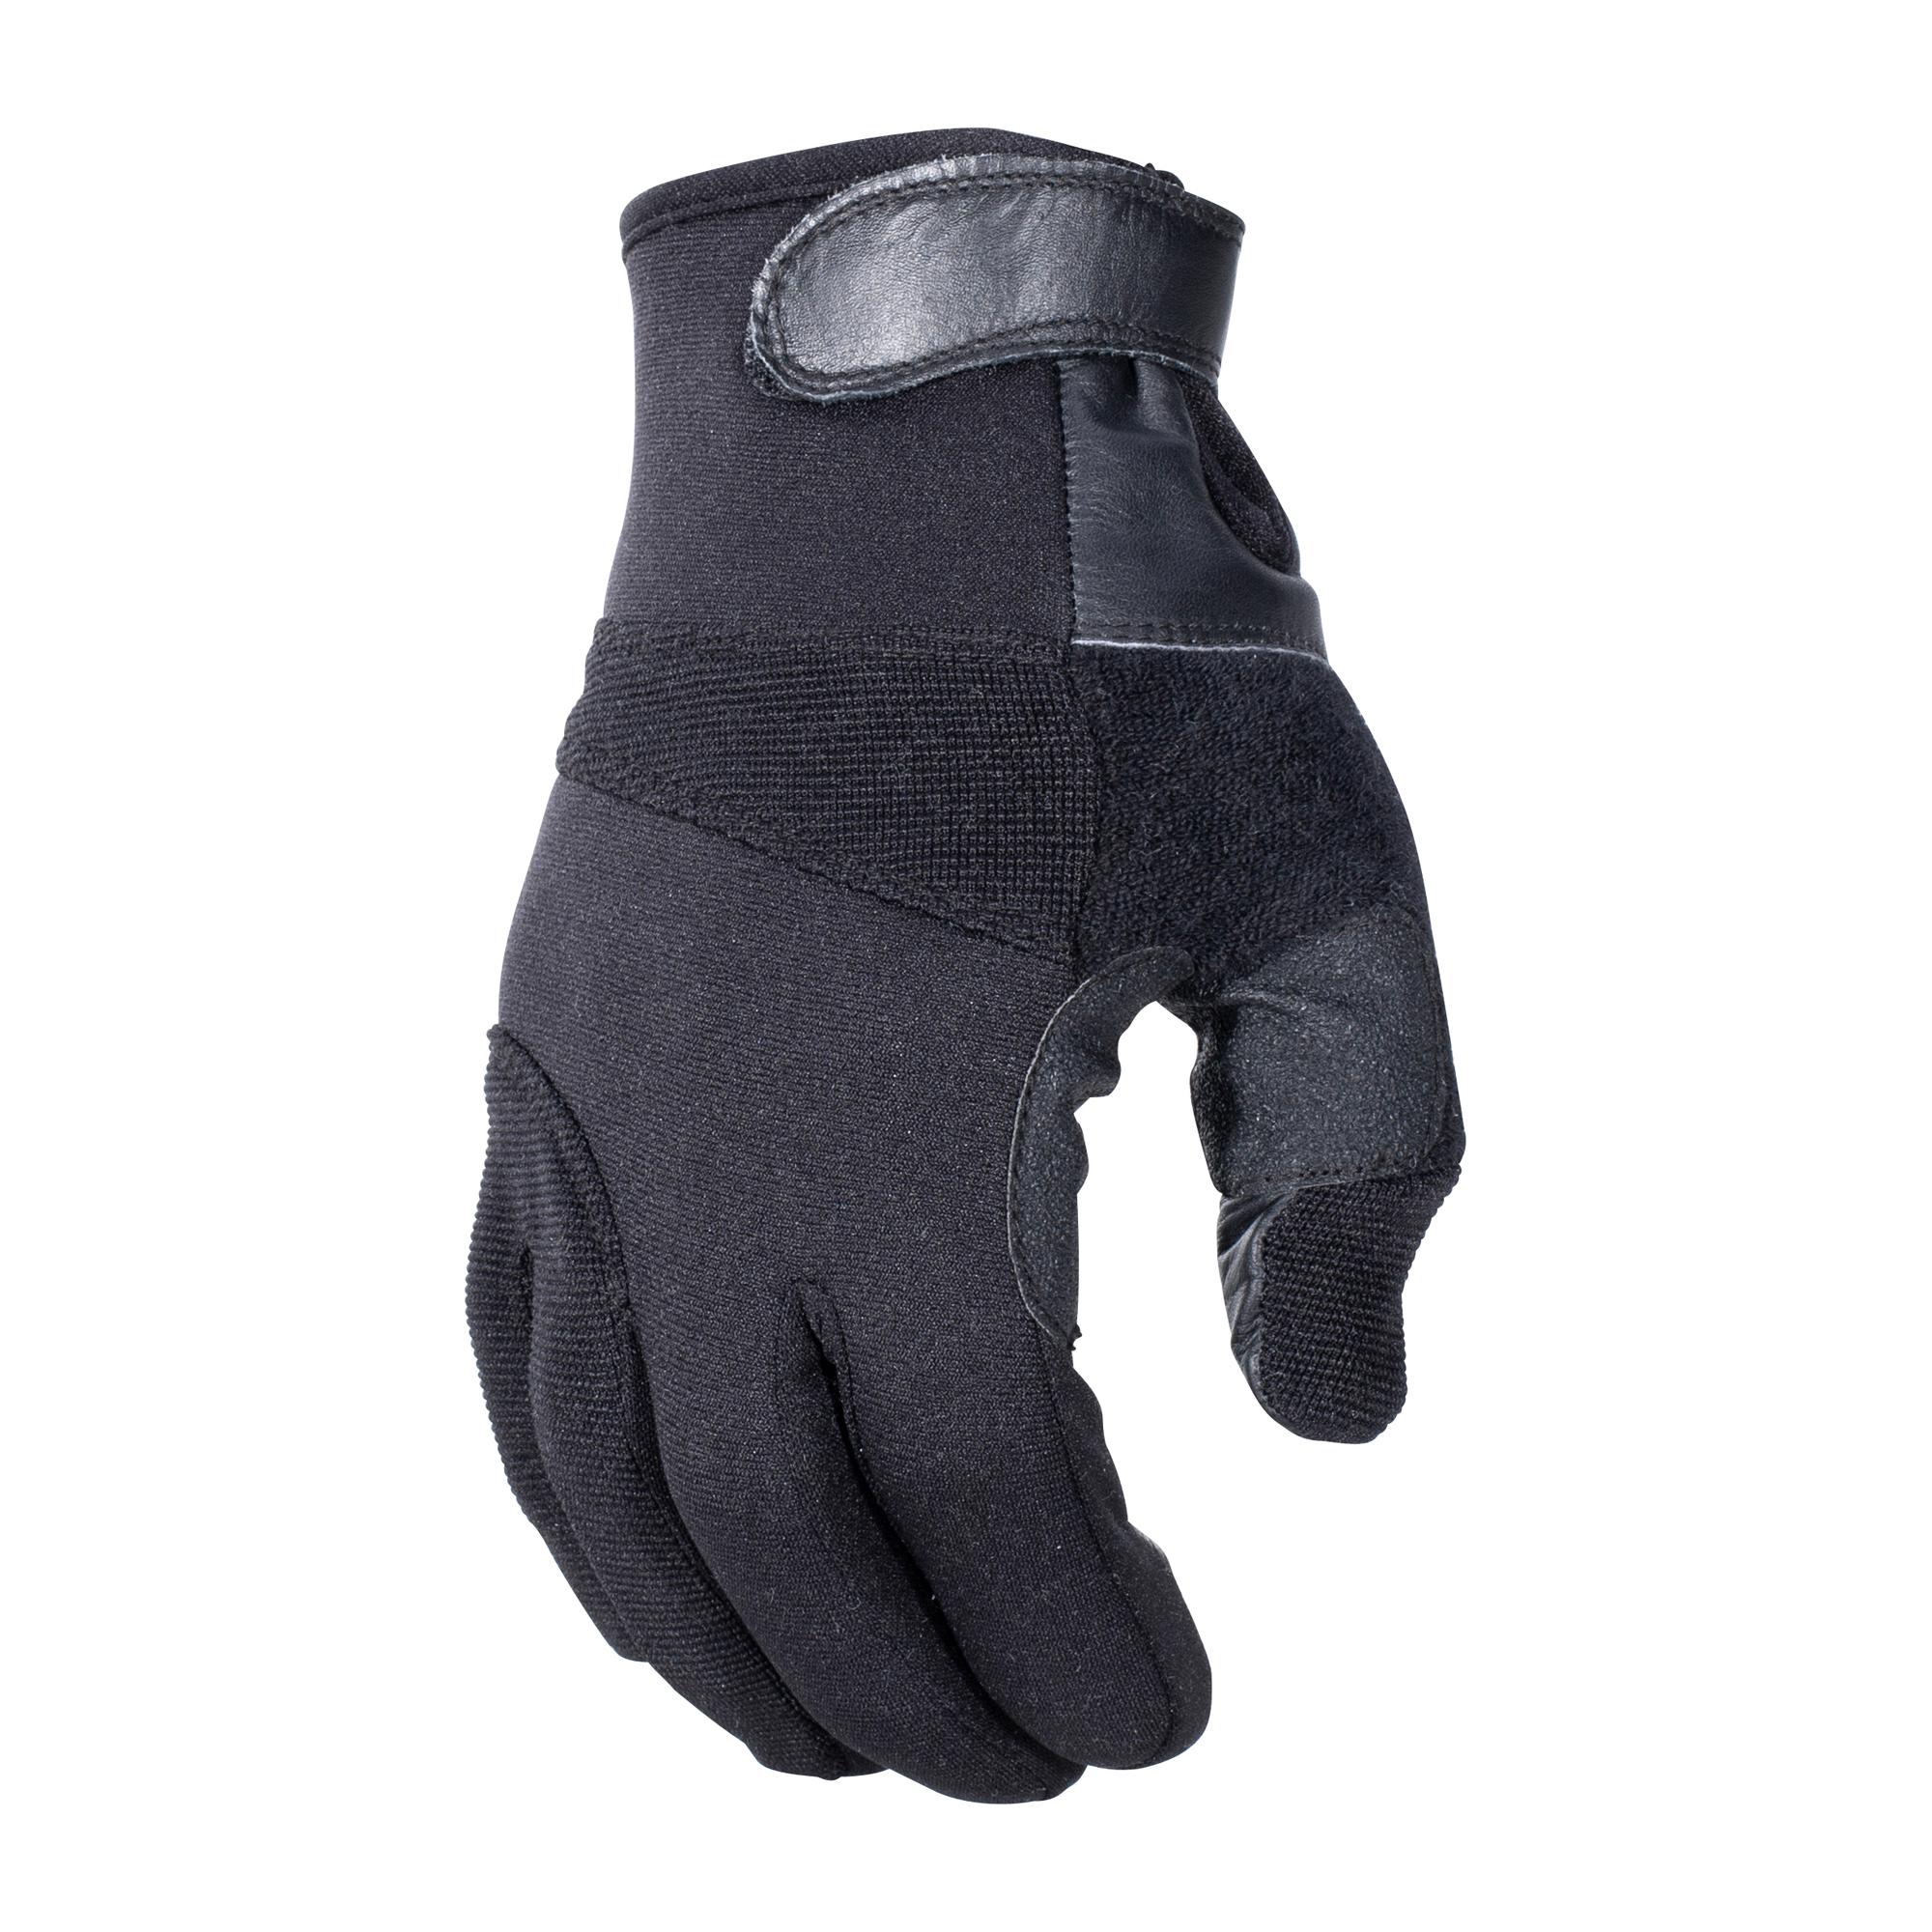 Tactical Gloves Cut Resistant black